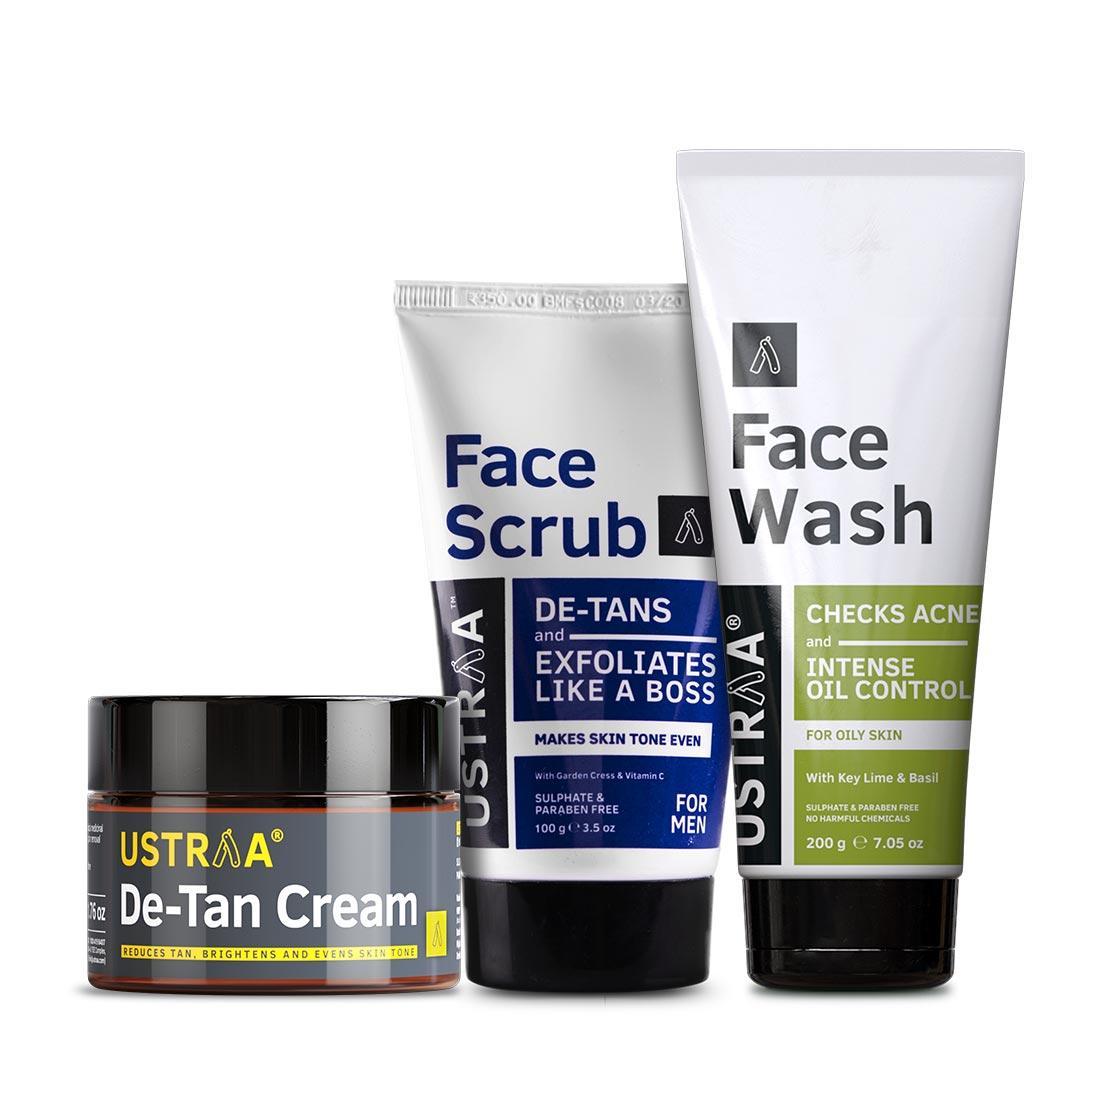 Ustraa De-Tan & Anti Pollutant Kit for Men (Set of 3): Face Scrub, Face Wash, and De-Tan Cream